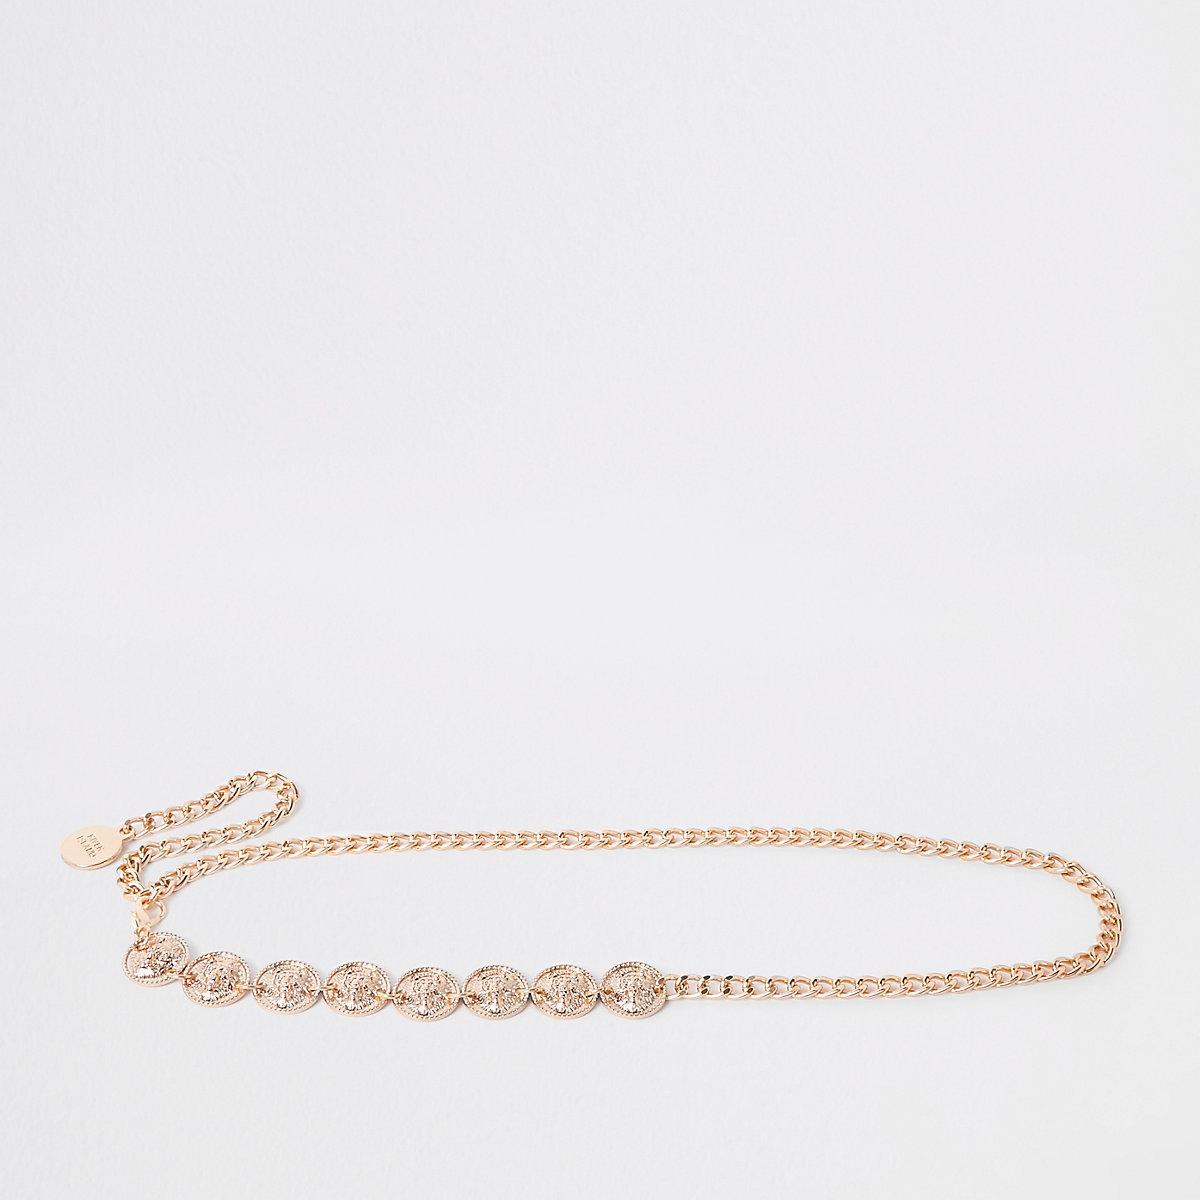 Gold color jaguar coin head waist belt